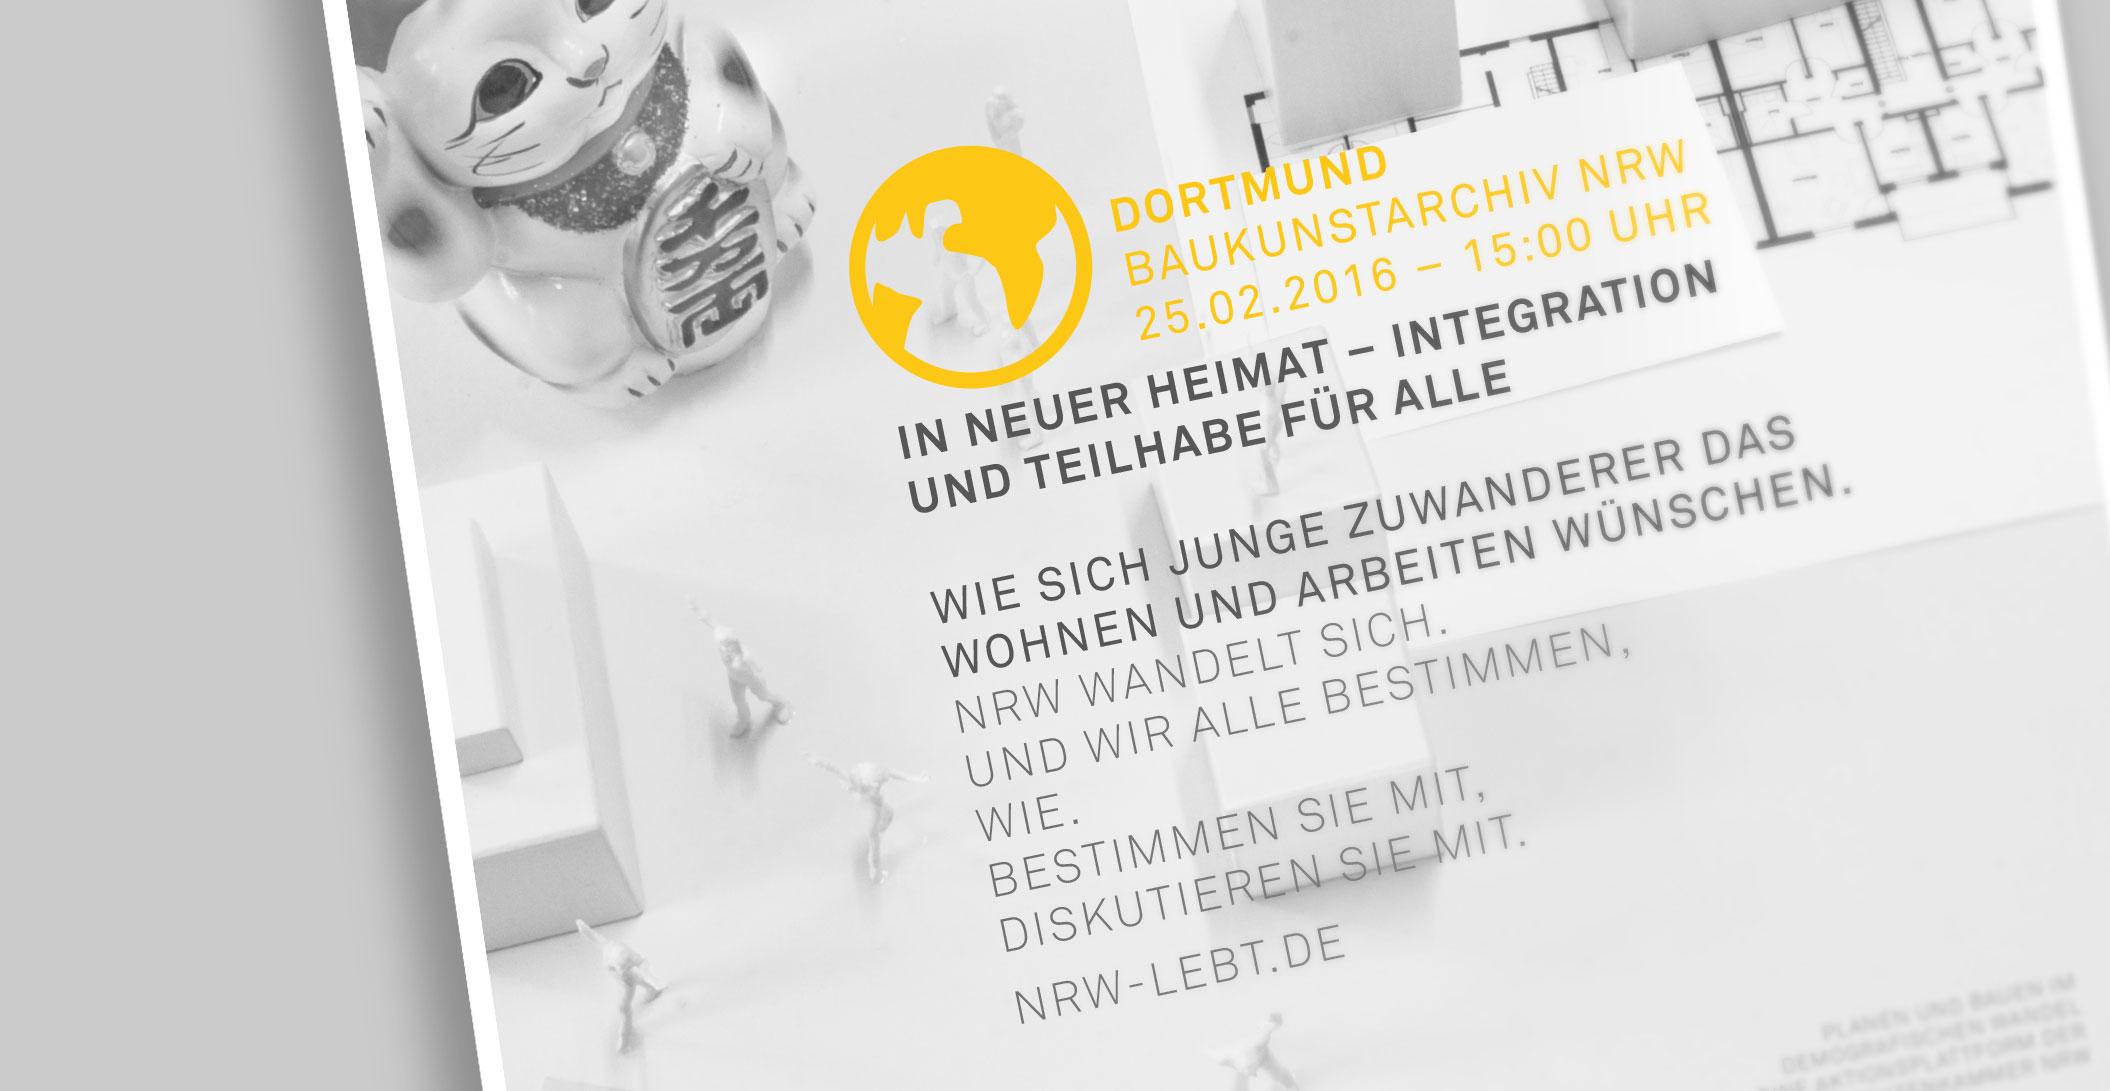 Plakat – Detail - Architektenkammer NRW - NRW lebt.